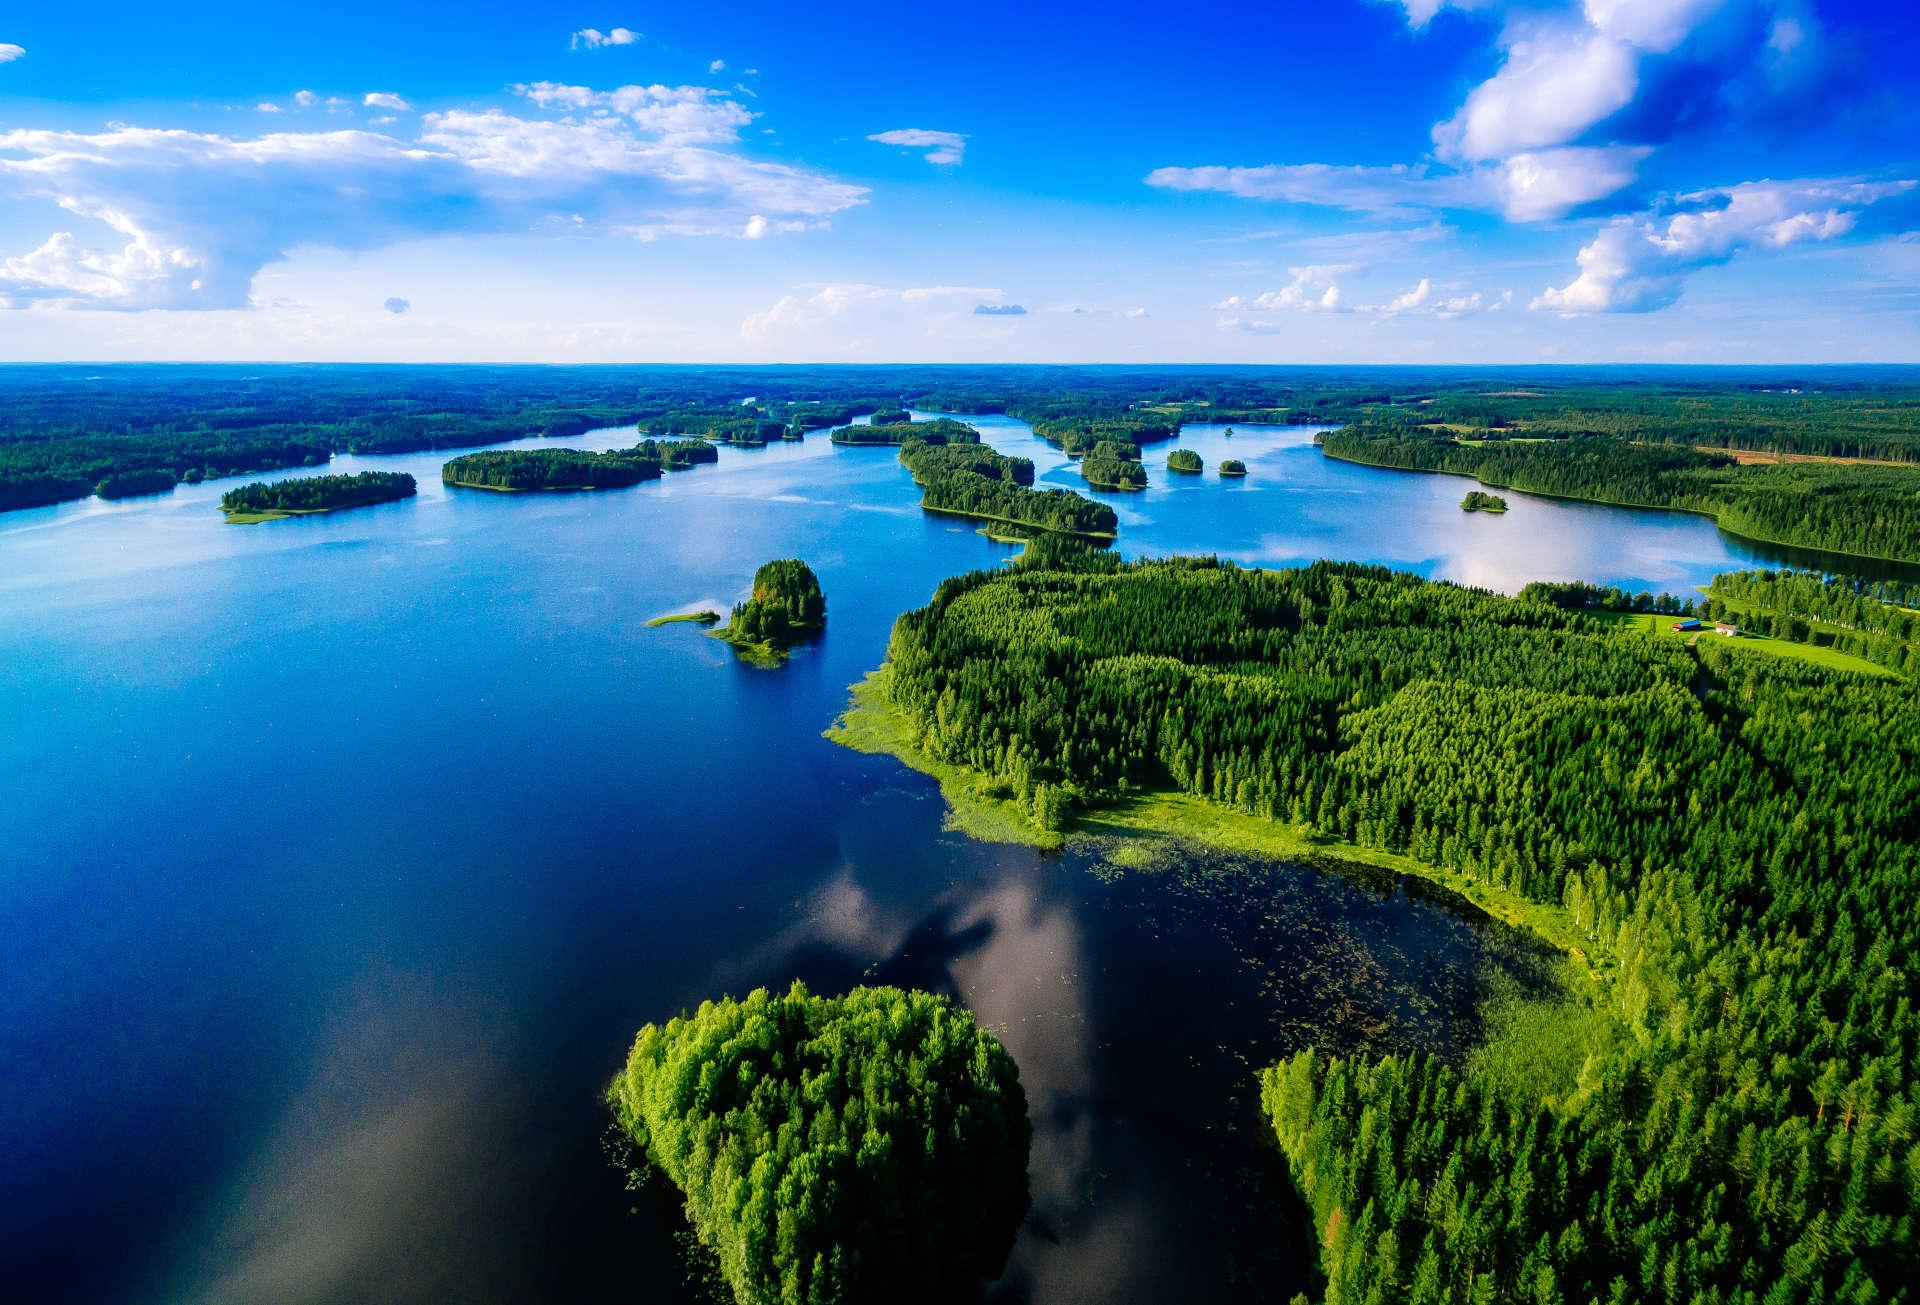 Scanforest forêt ciel lac